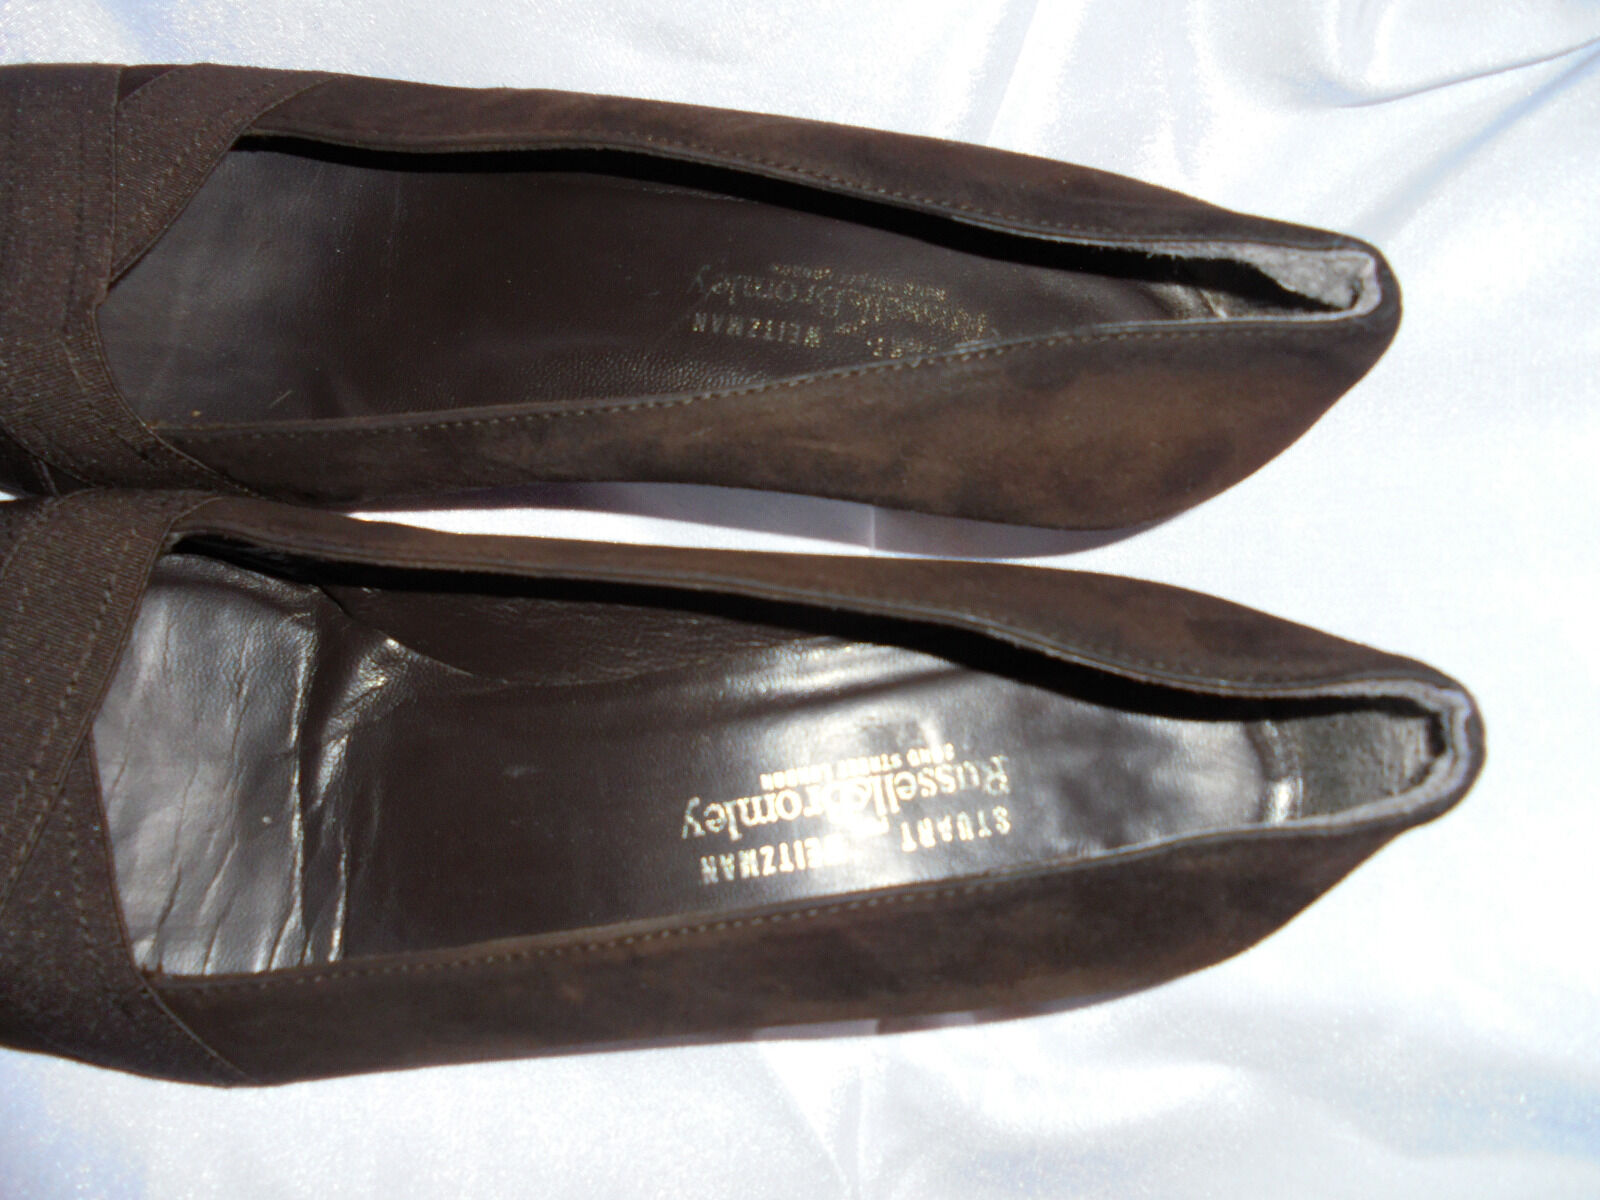 STUART WEITZMAN WOMEN GOLD GOLD WOMEN SLIP ON STRAP  BUCKLE SANDAL SIZE UK 5 EU 38 US 7.5M 4ac329